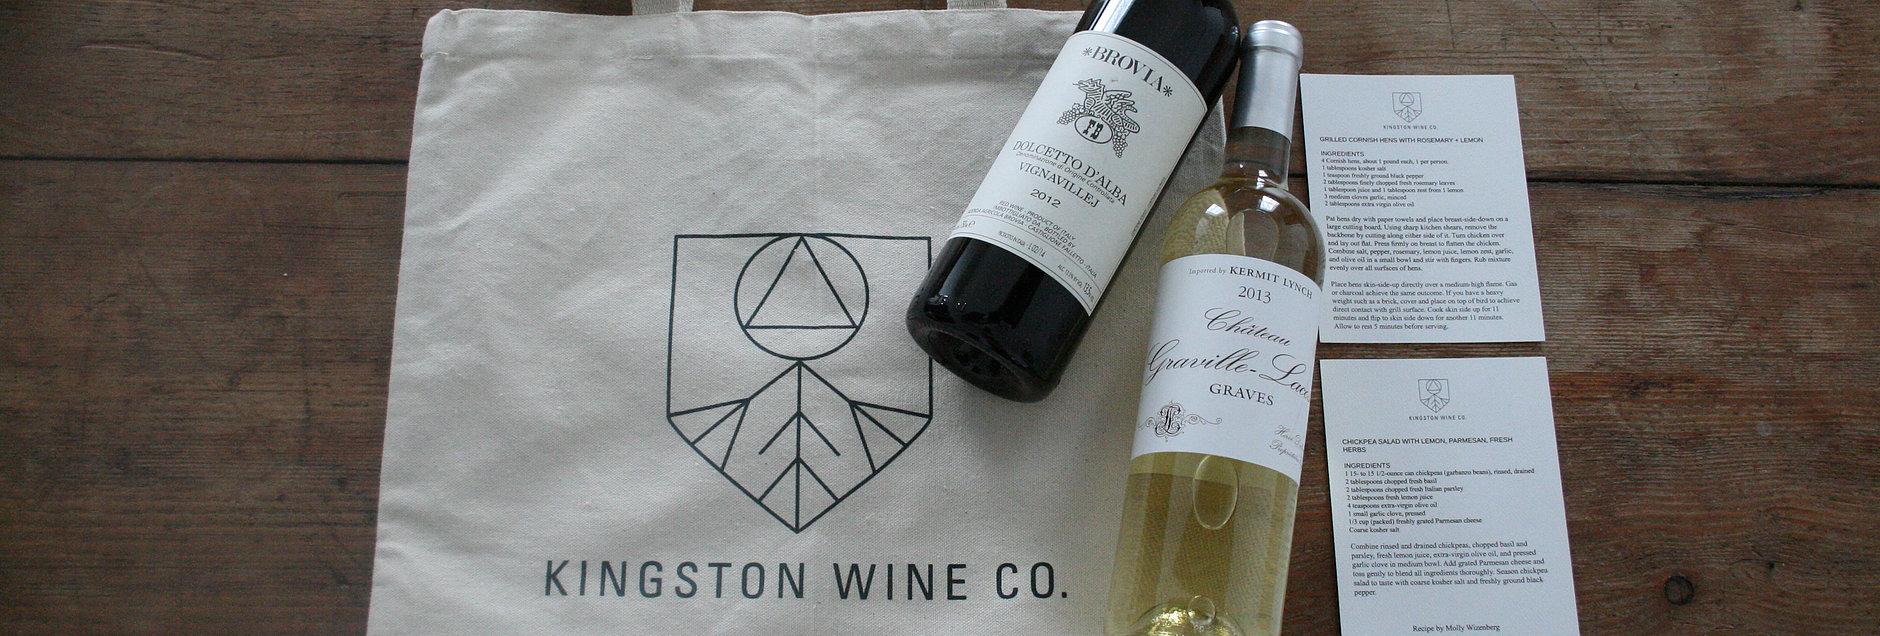 Kingston Wine Co_wineshare.jpg